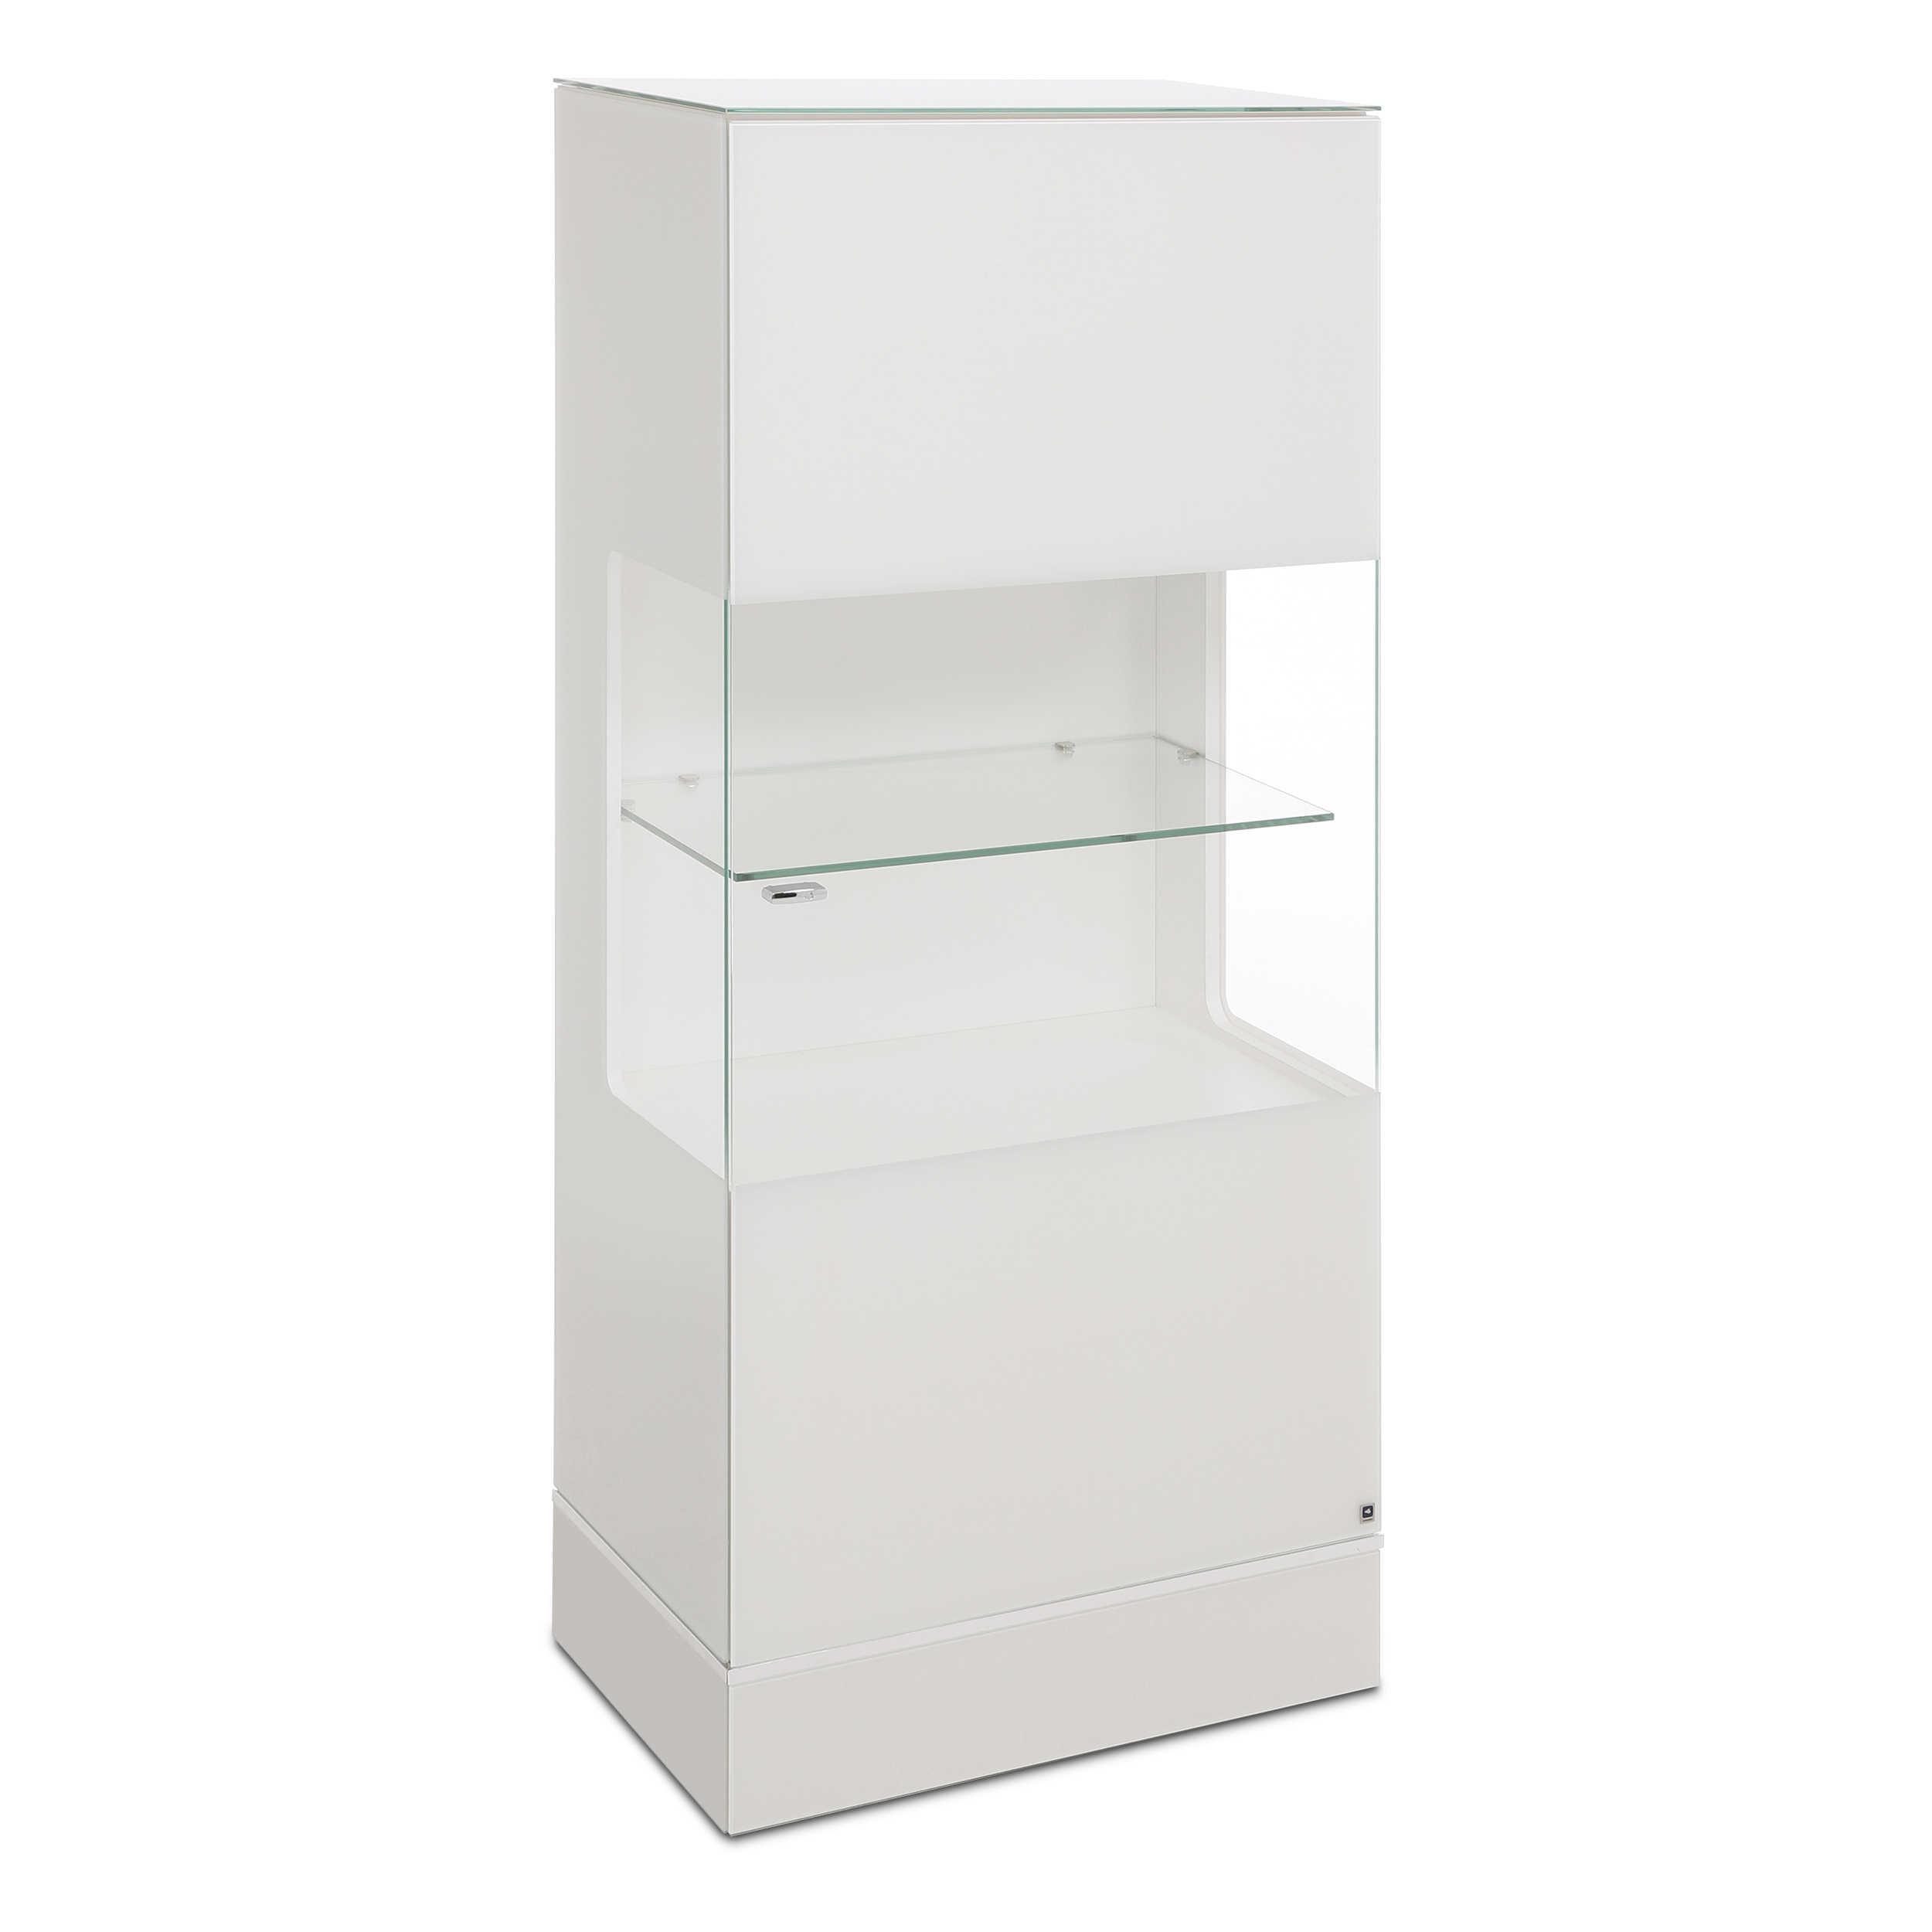 leonardo living highboard cube wei glas online kaufen bei. Black Bedroom Furniture Sets. Home Design Ideas